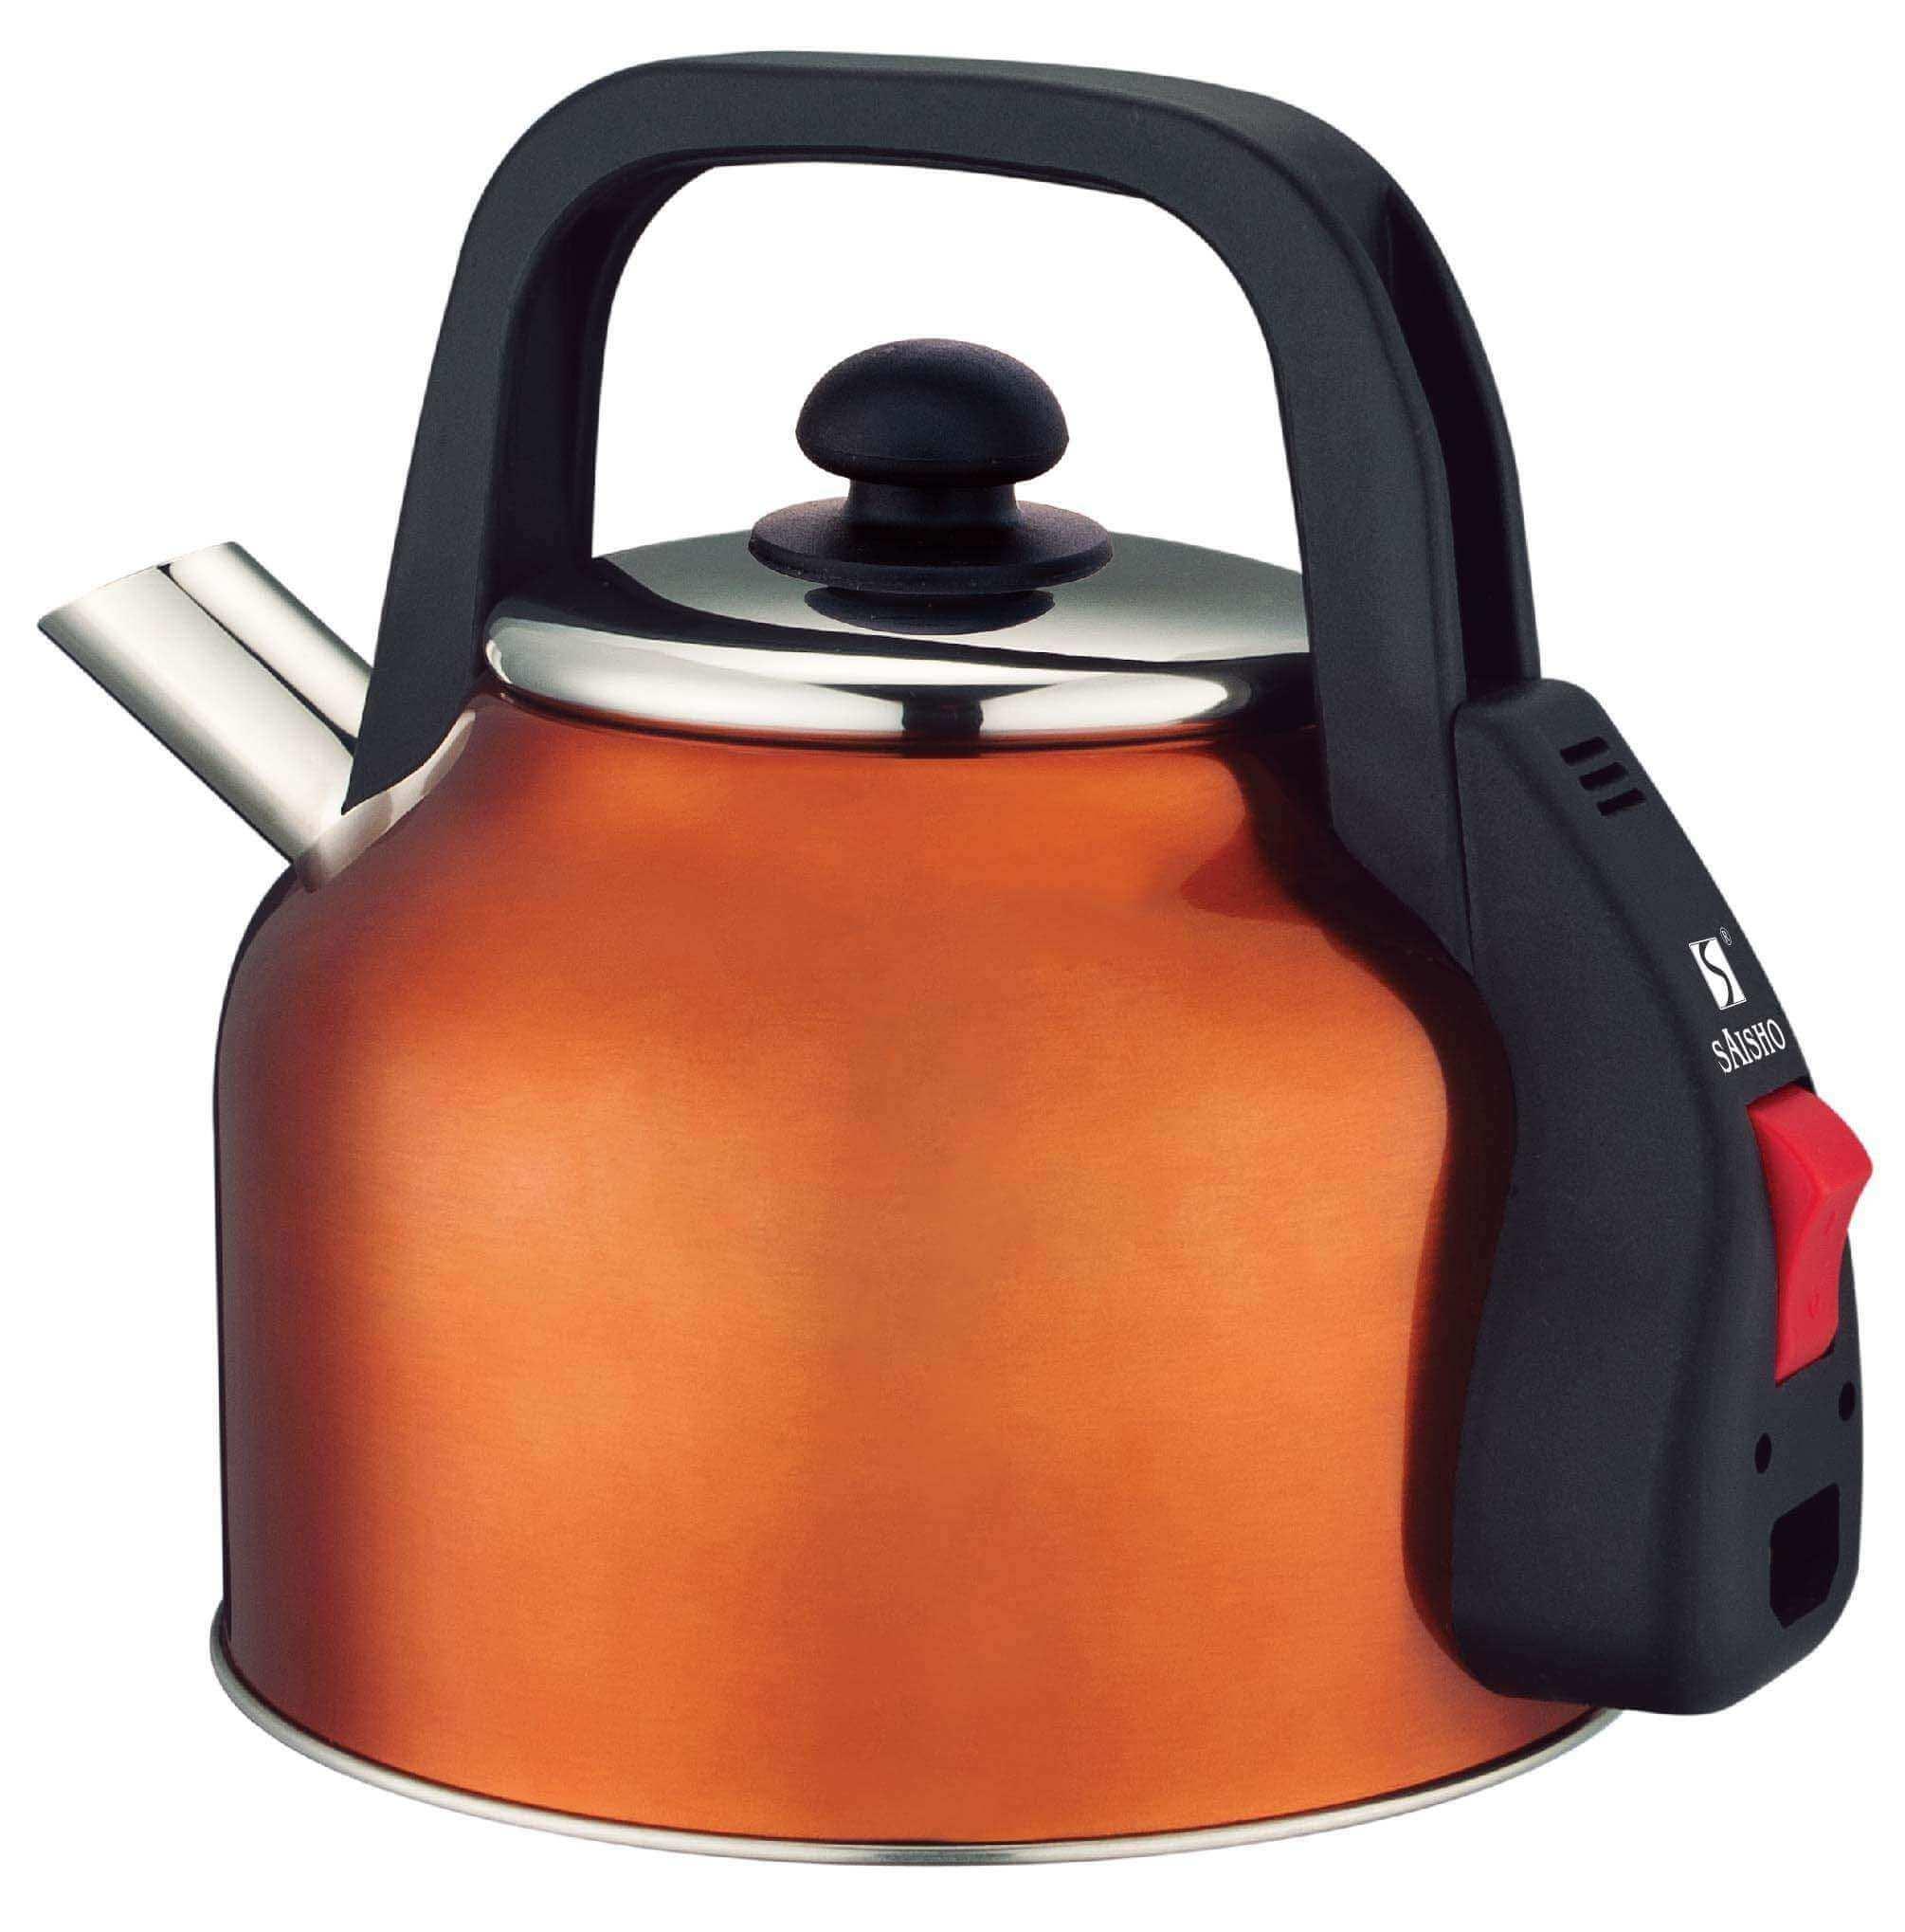 Electric Kettle Product ~ S saisho electric kettle nexus